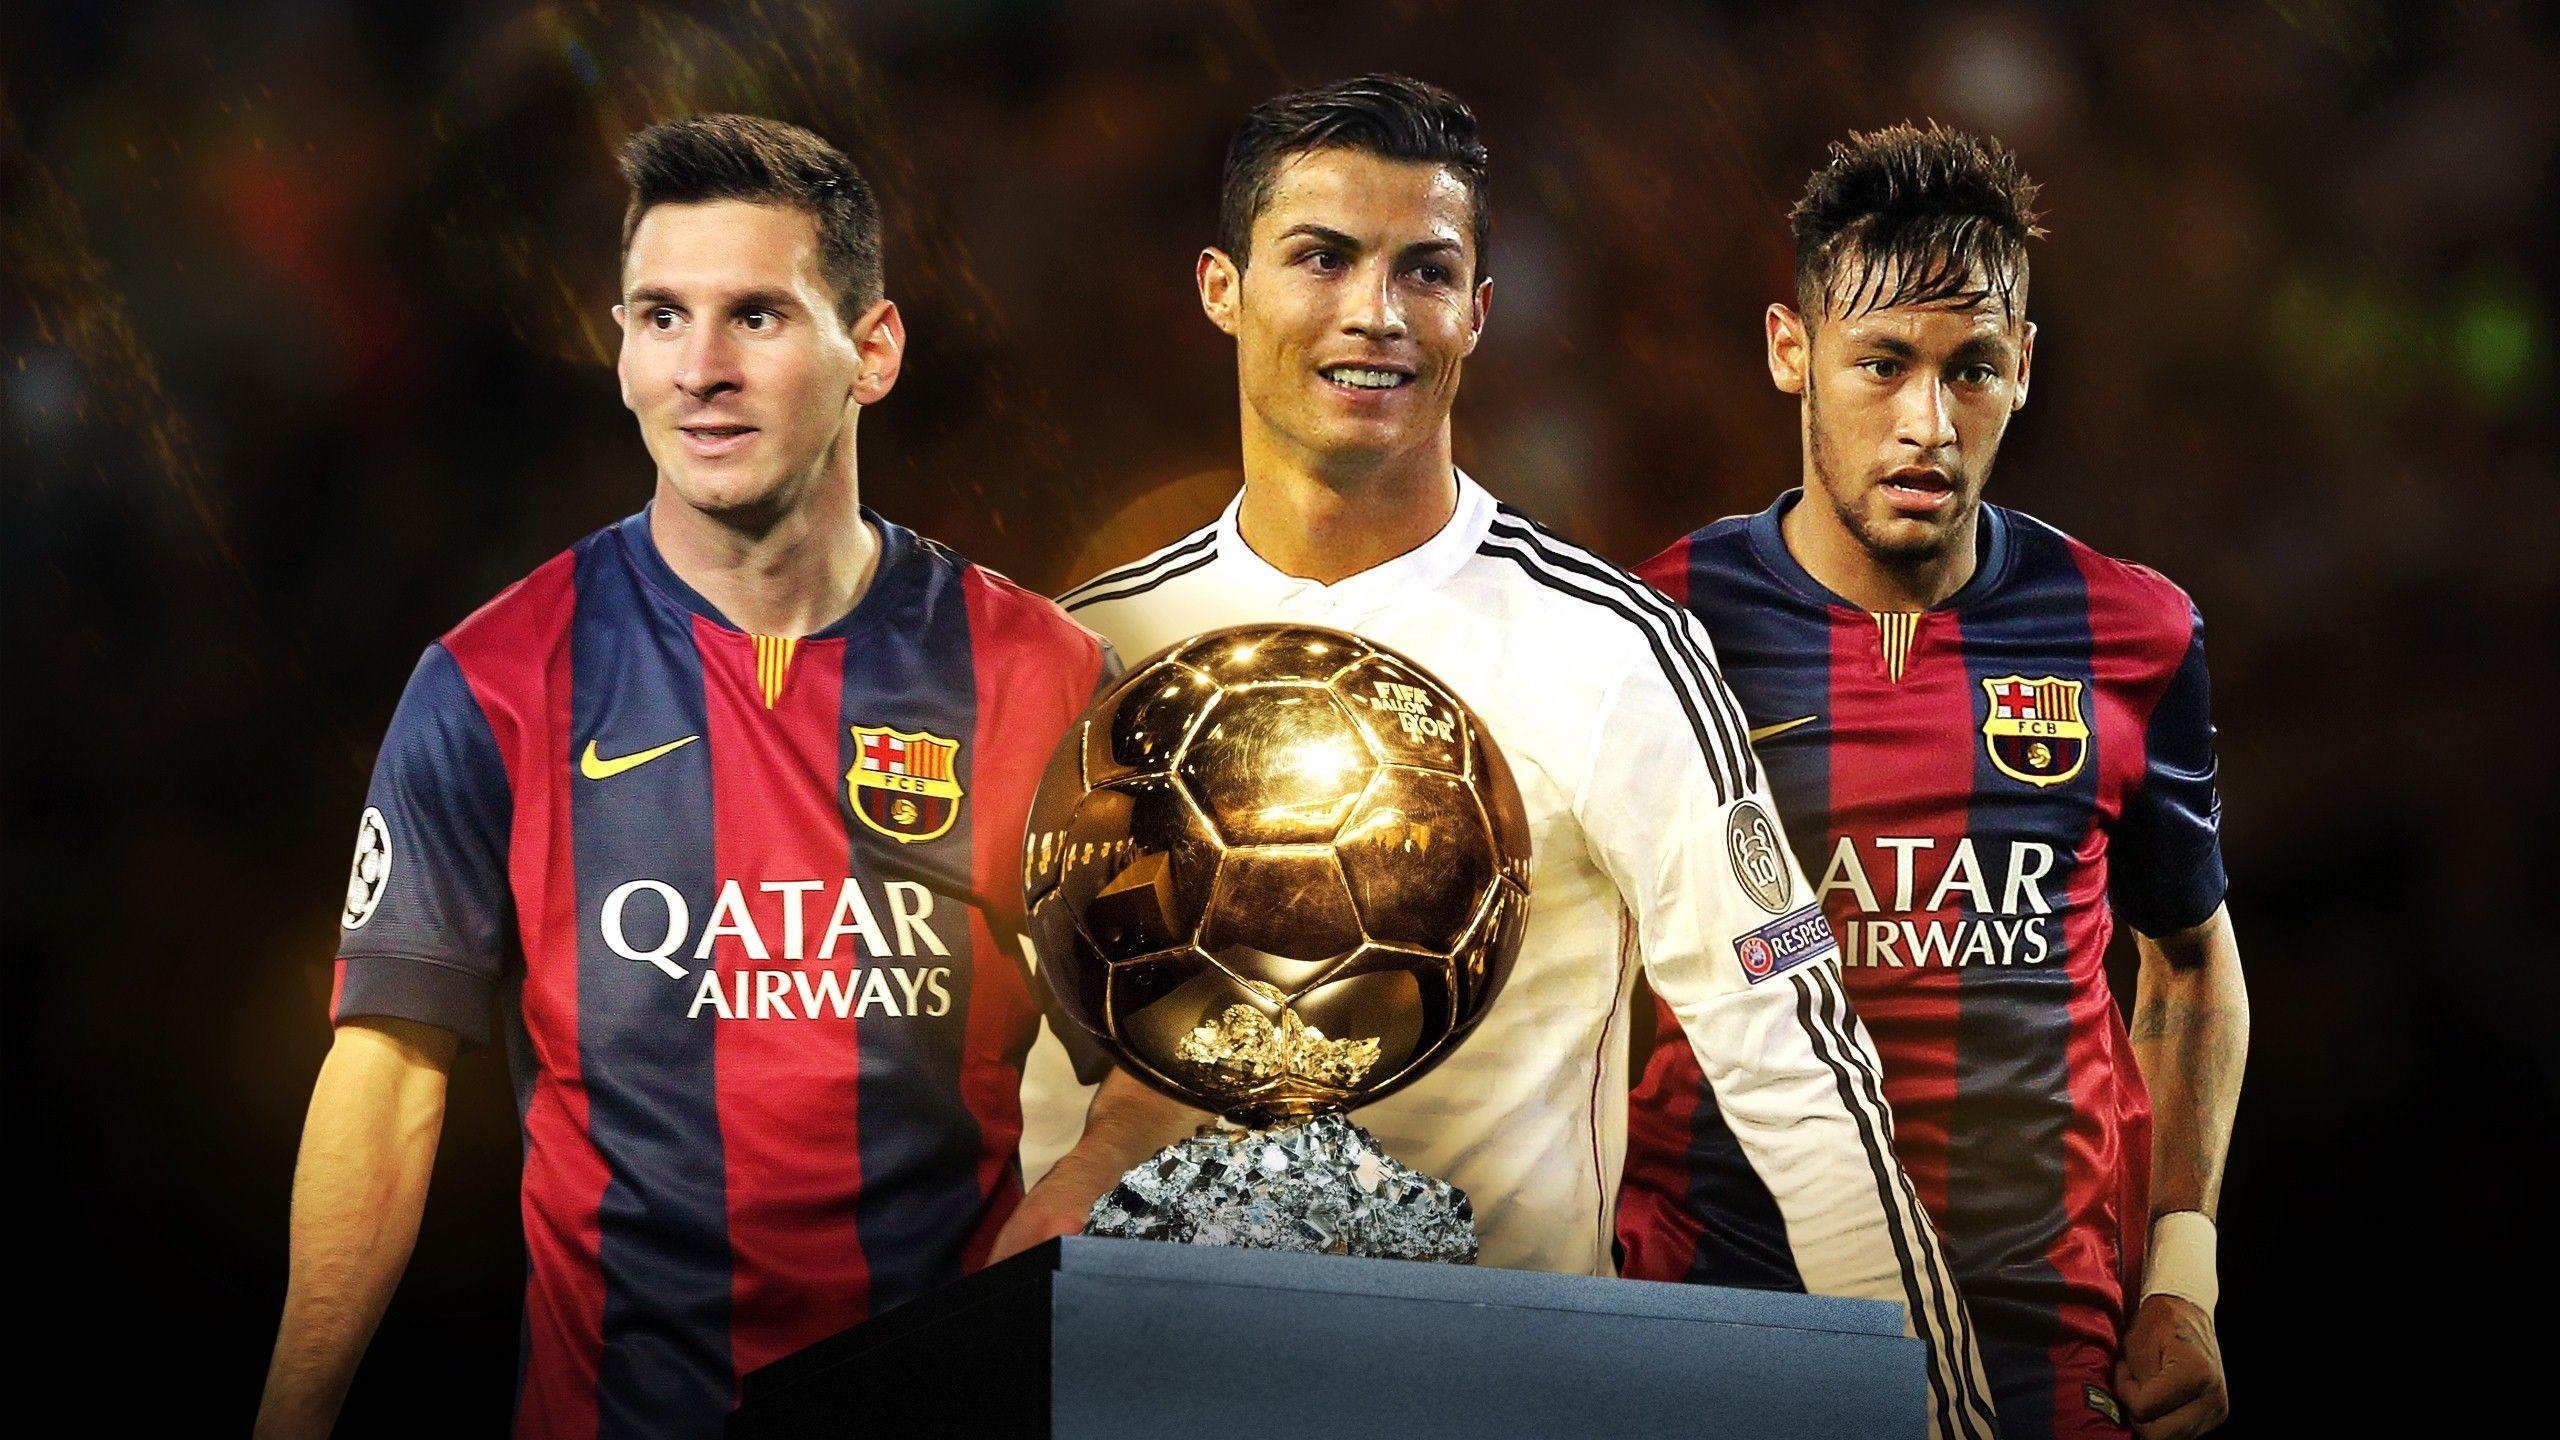 Lionel Messi, Cristiano Ronaldo and Neymar